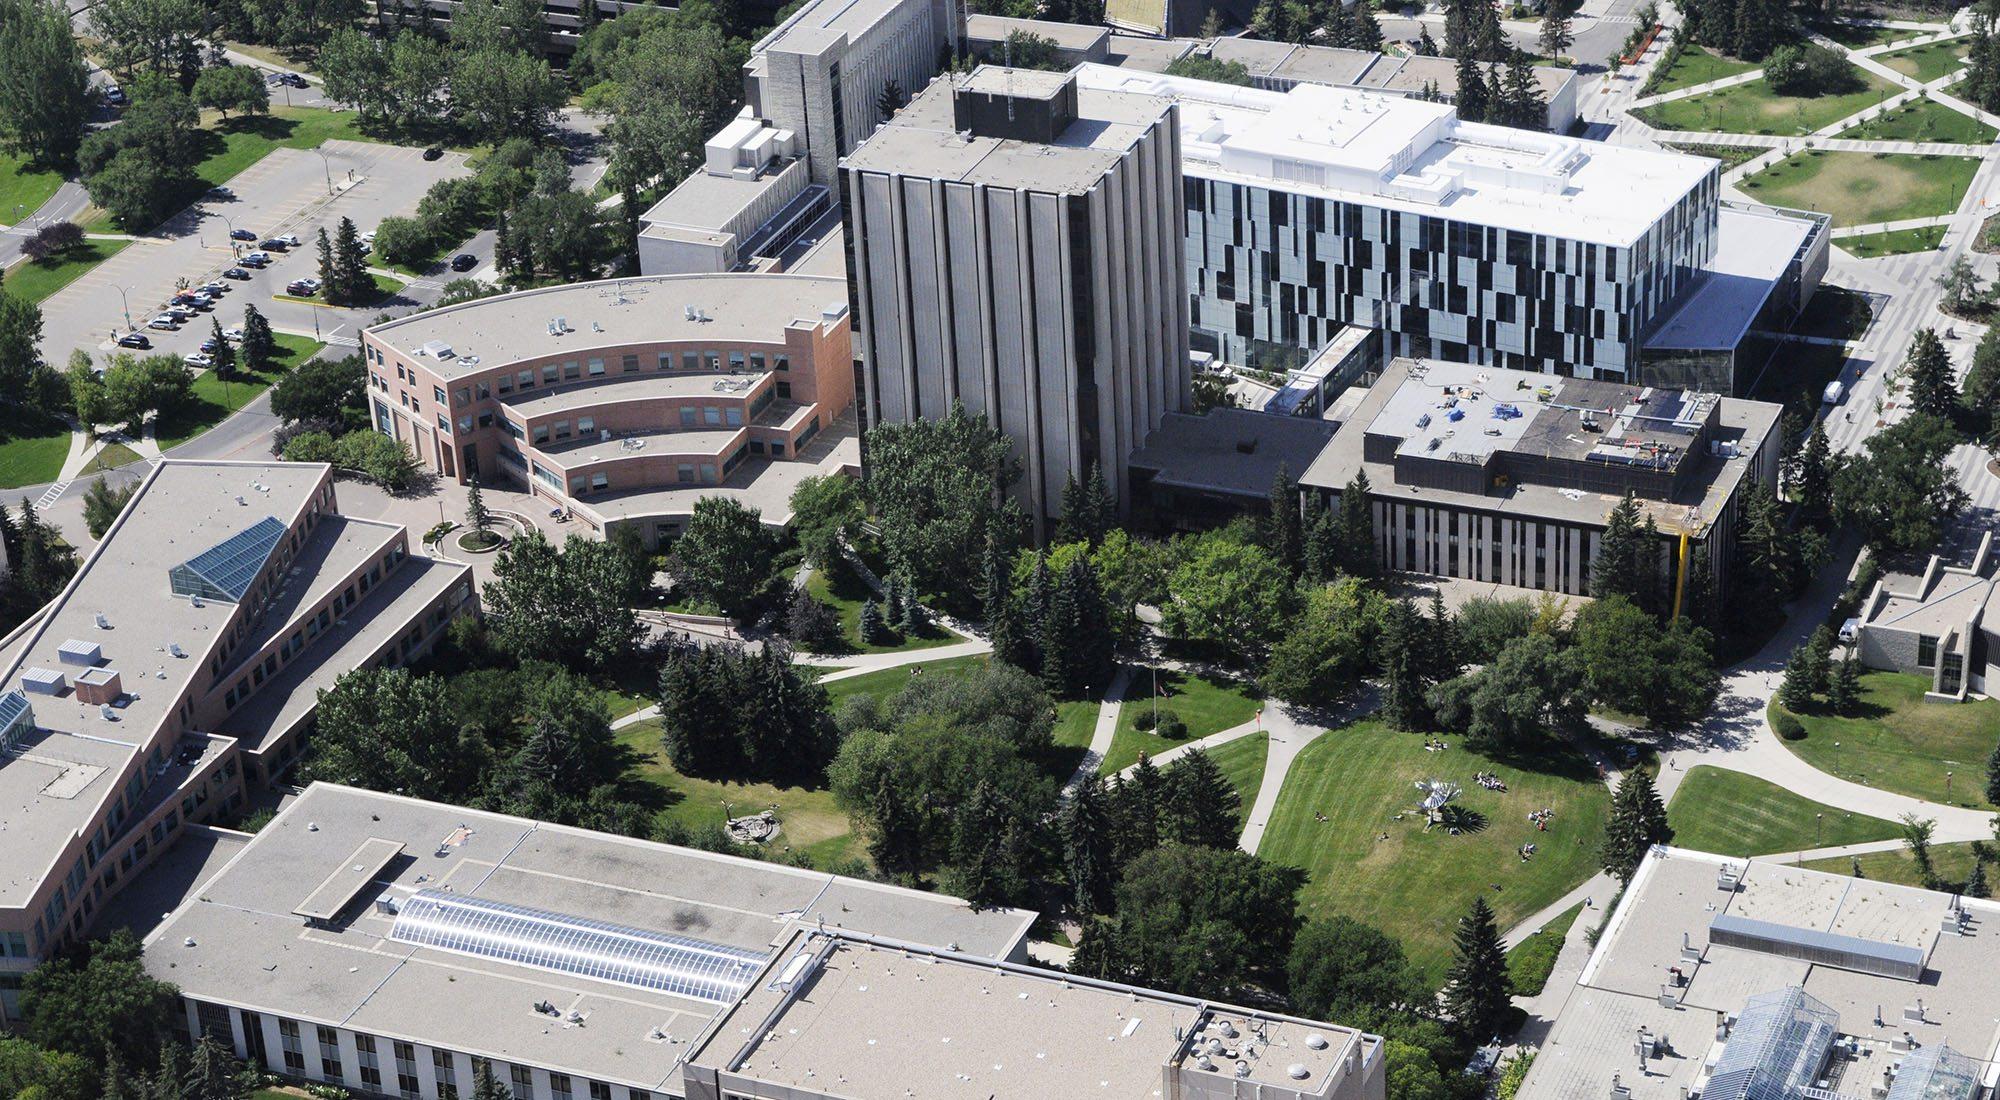 University of calgary main campus university of calgary